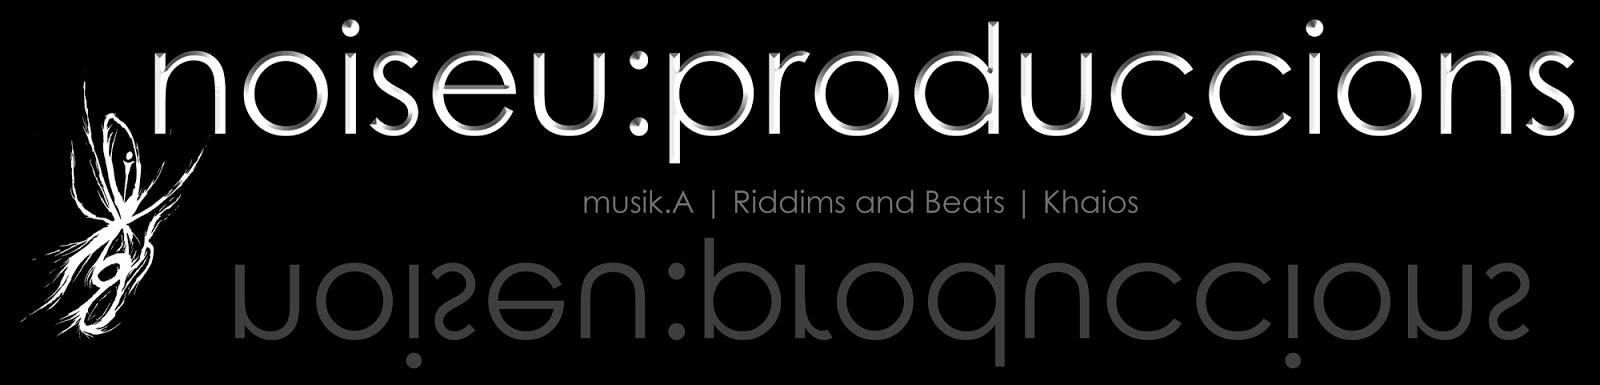 Noiseu Produccions Musik.A | Riddims and Beats | Khaios